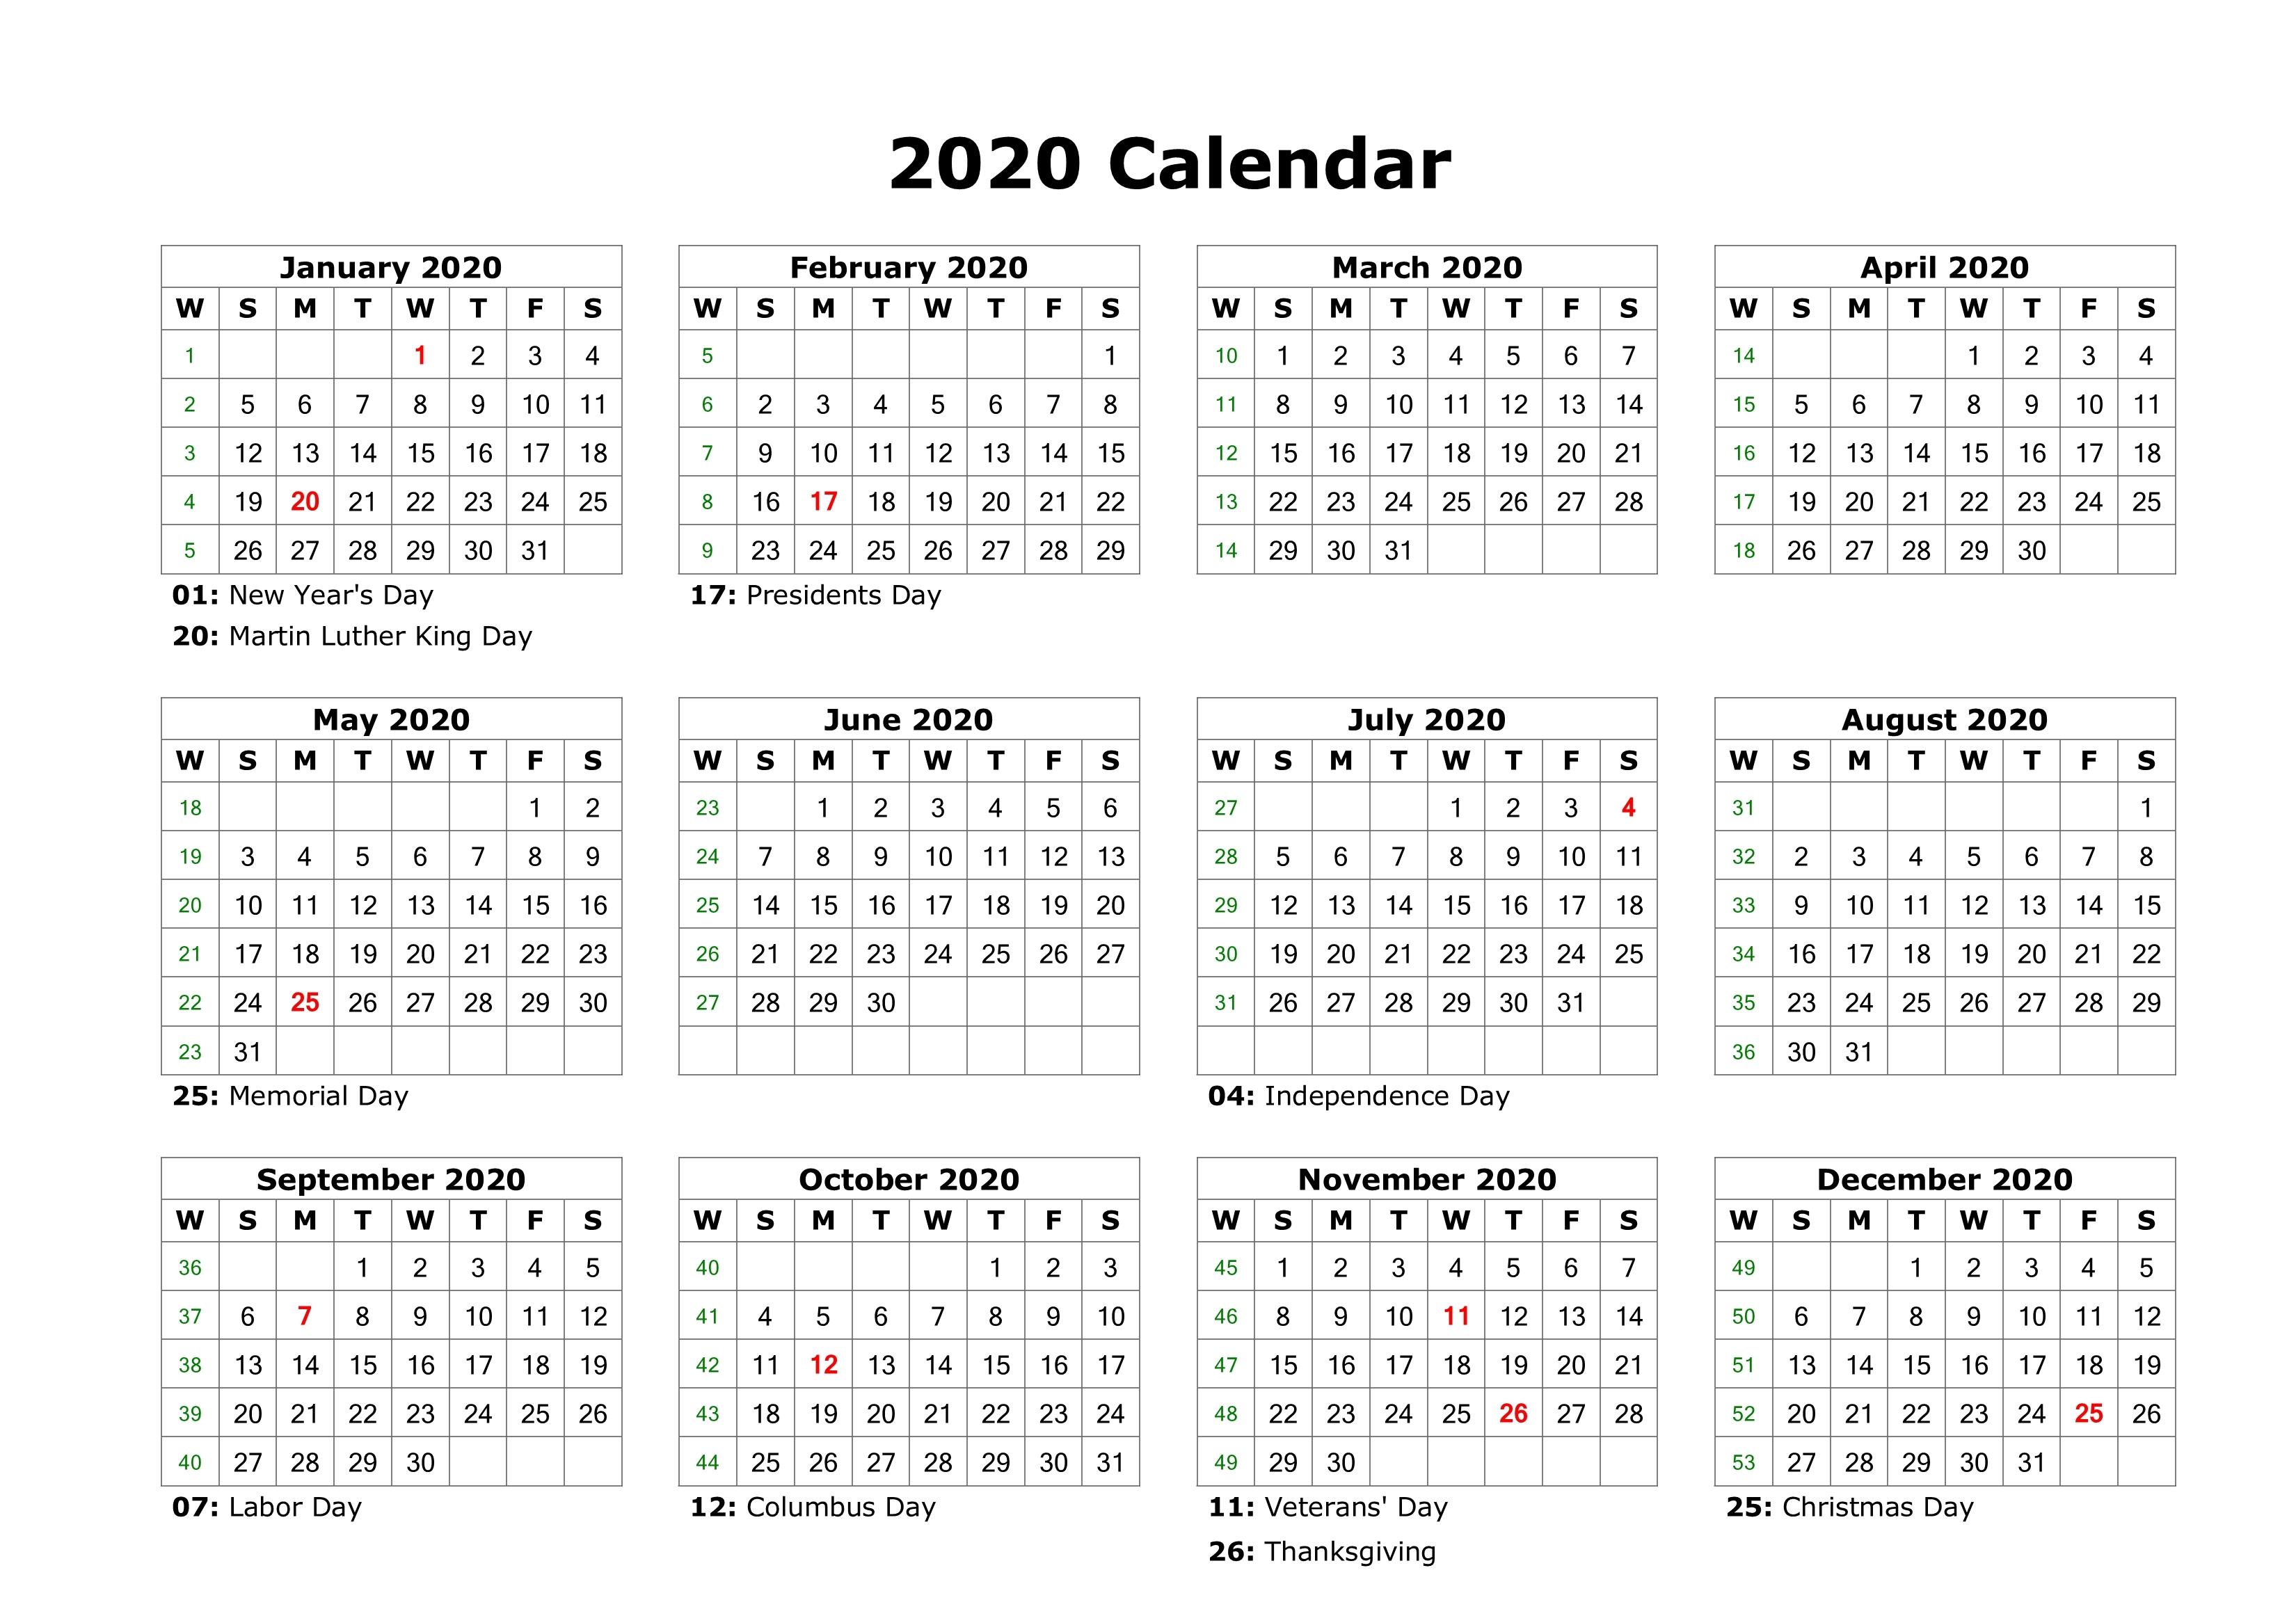 Free Editable 2020 Calendar Printable Template for Free Printable 2020 Employee Attendance Calendar